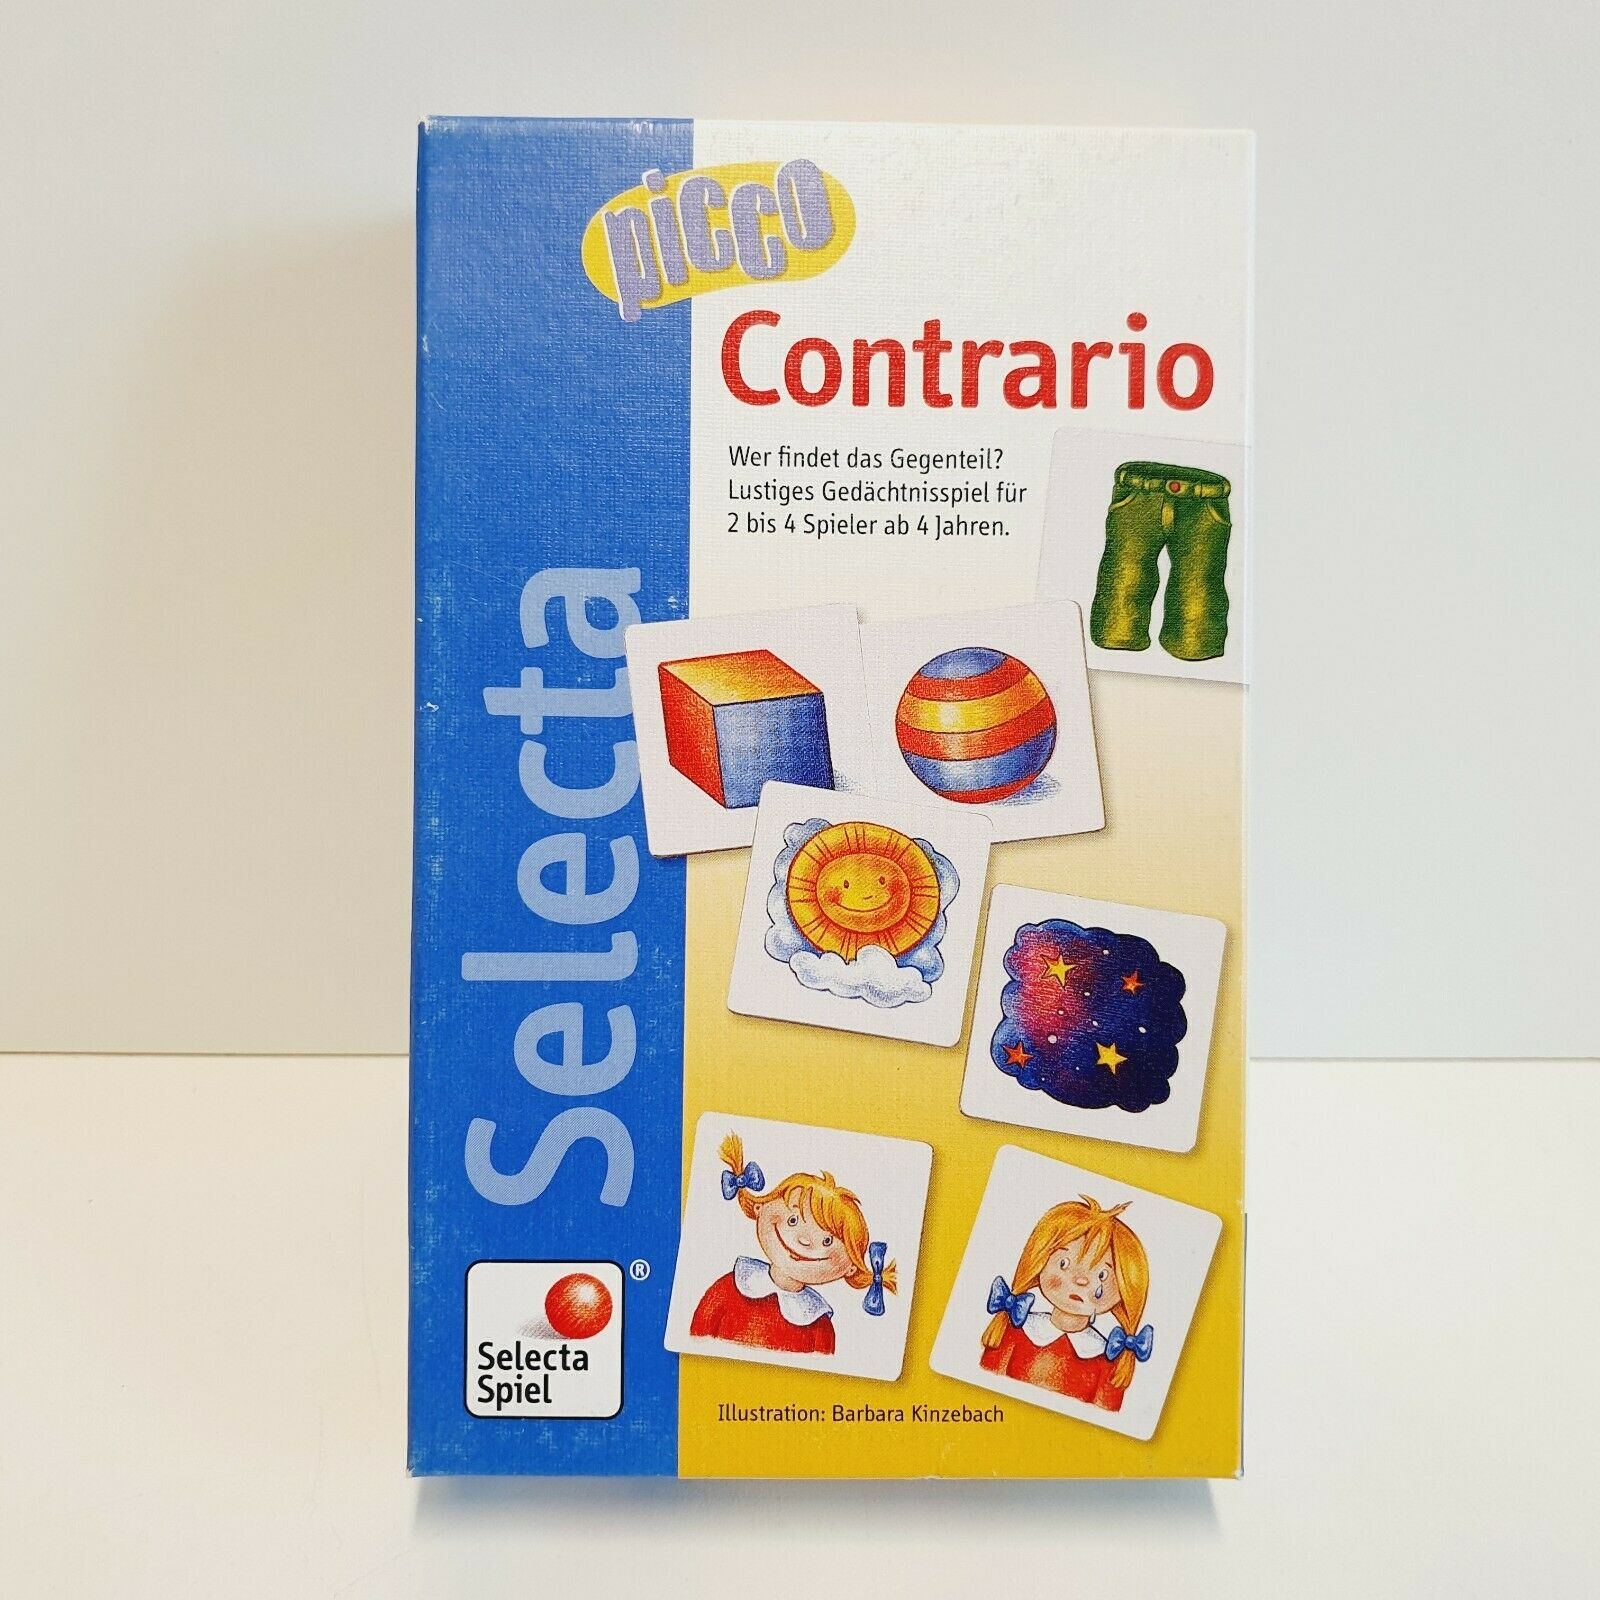 Picco Contrario - Gedächtnisspiel ab 4 Jahren - Selecta - 1 Karte fehlt